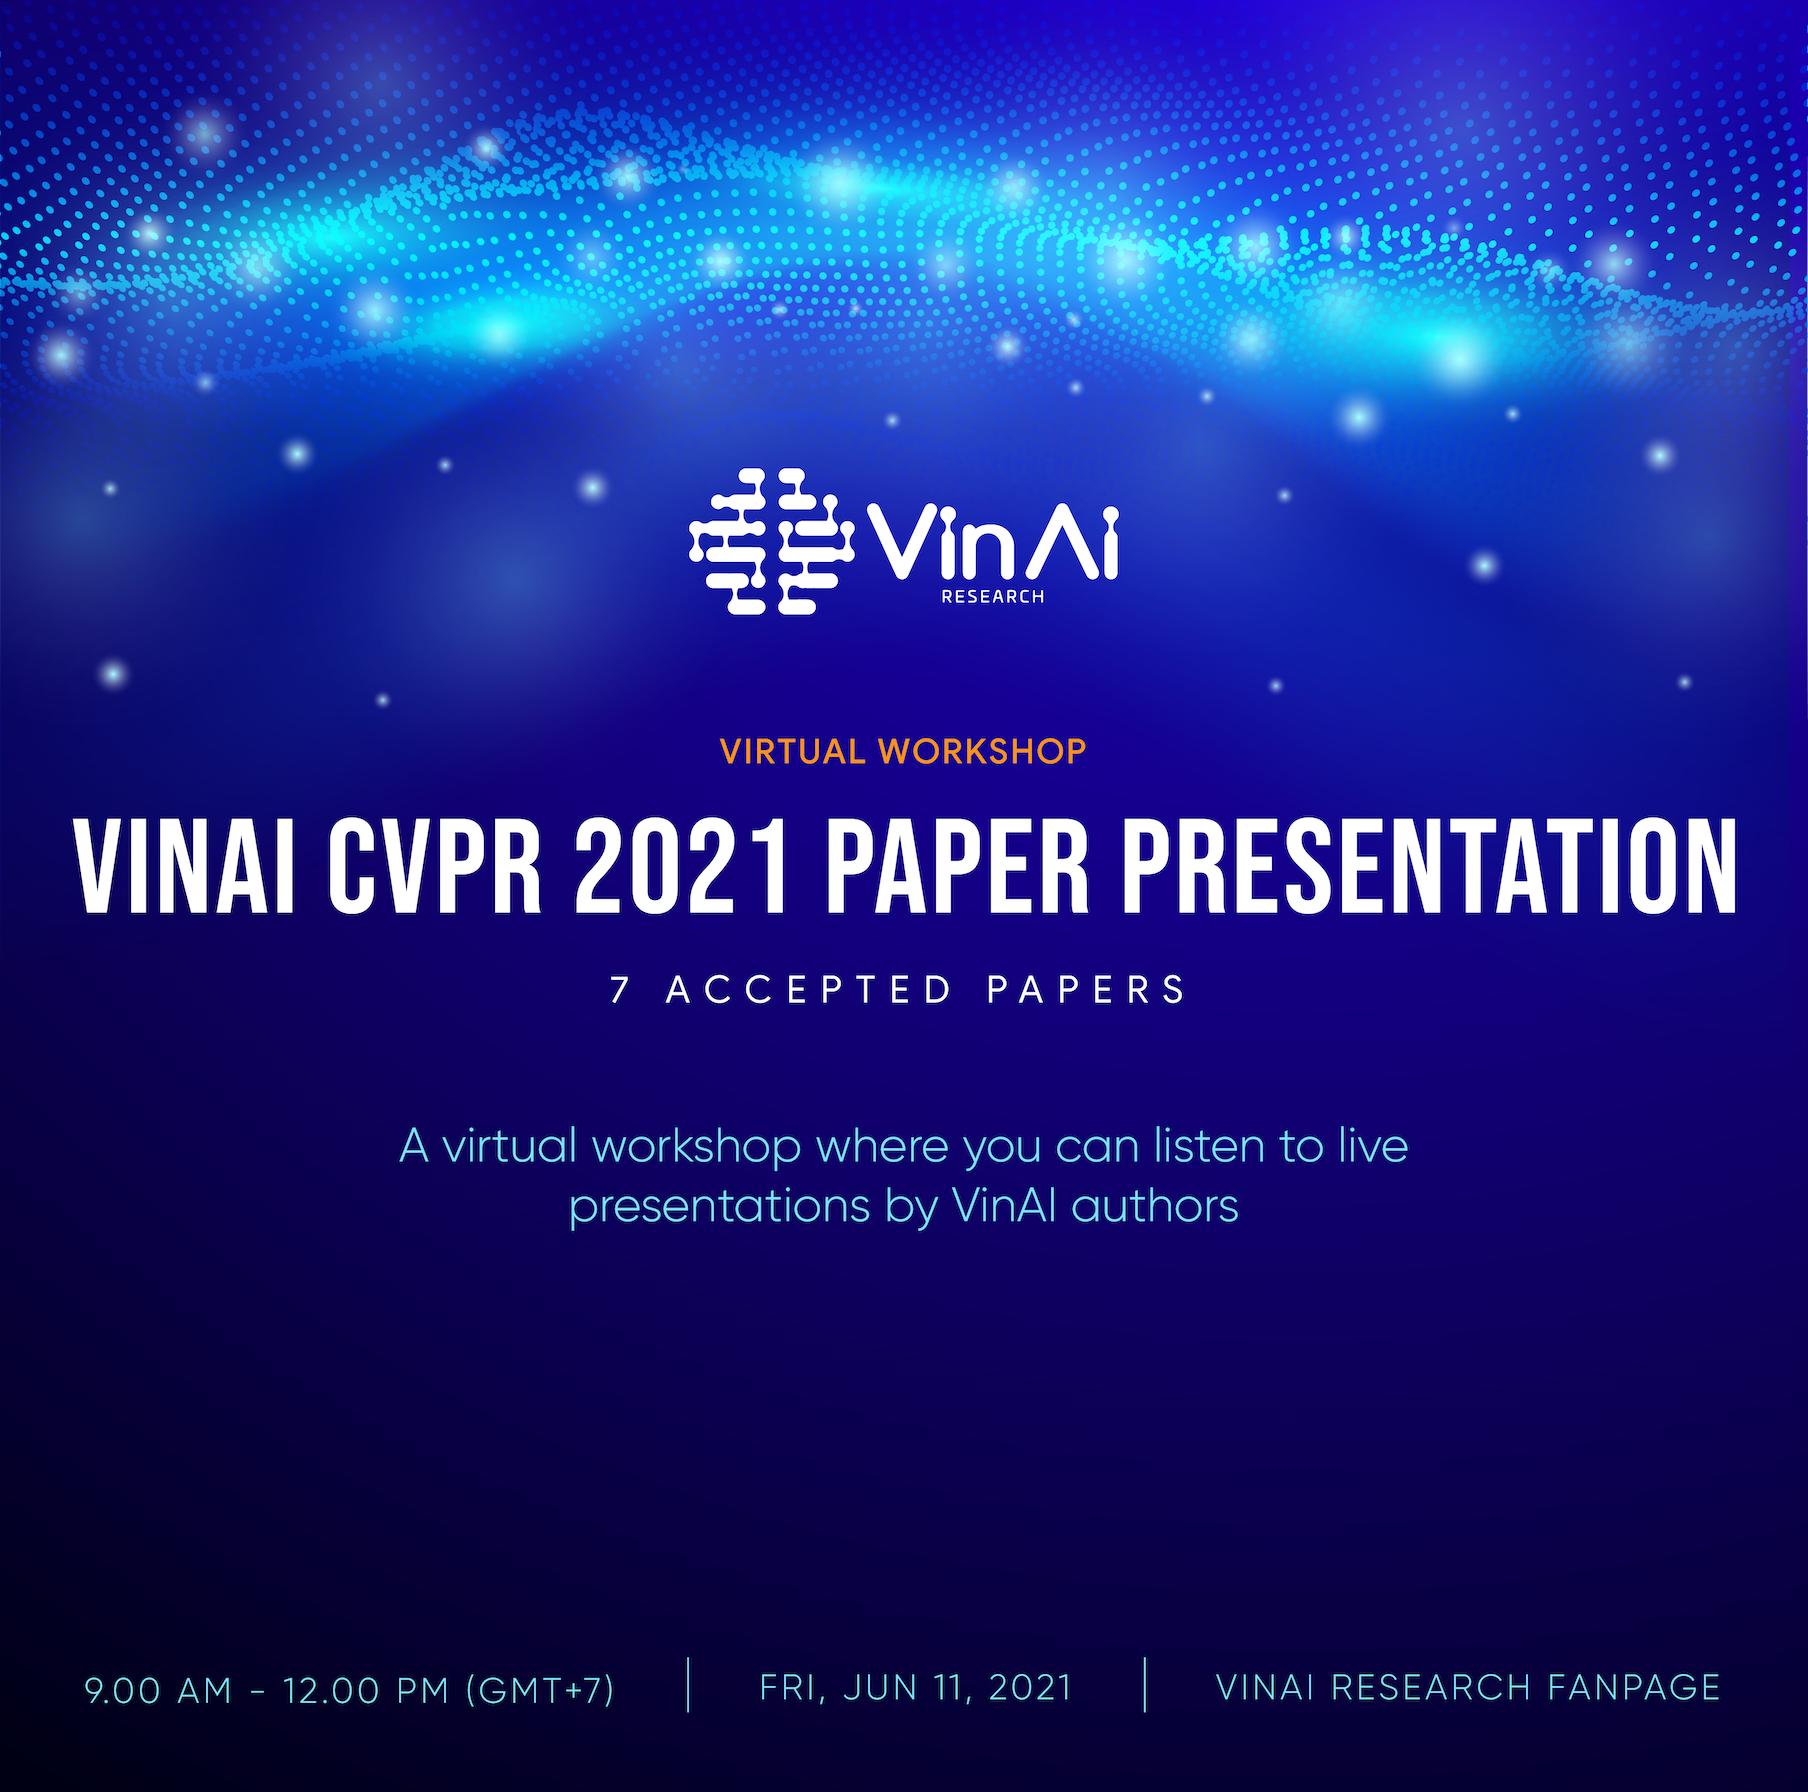 VinAI CVPR 2021 Paper Presentation